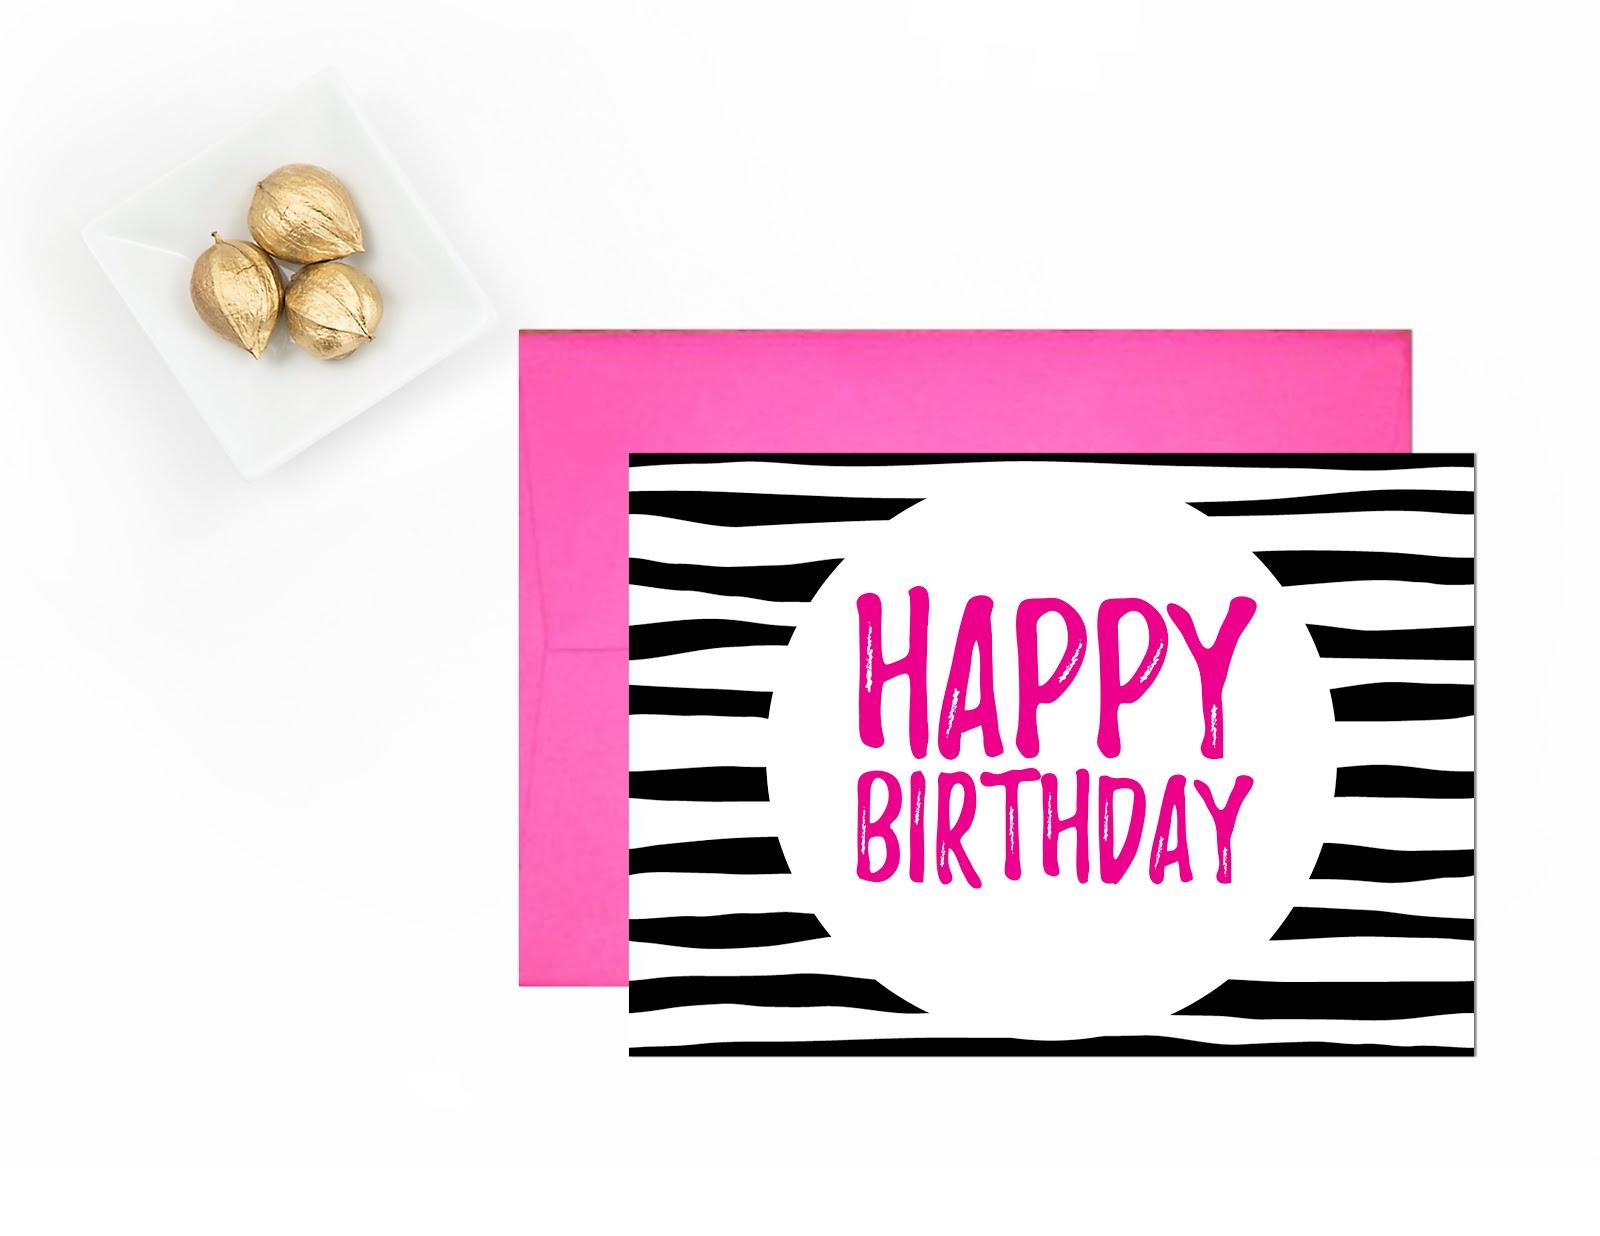 Happy Birthday   Free Printable Greeting Cards - Andree In Wonderland - Free Printable Bday Cards